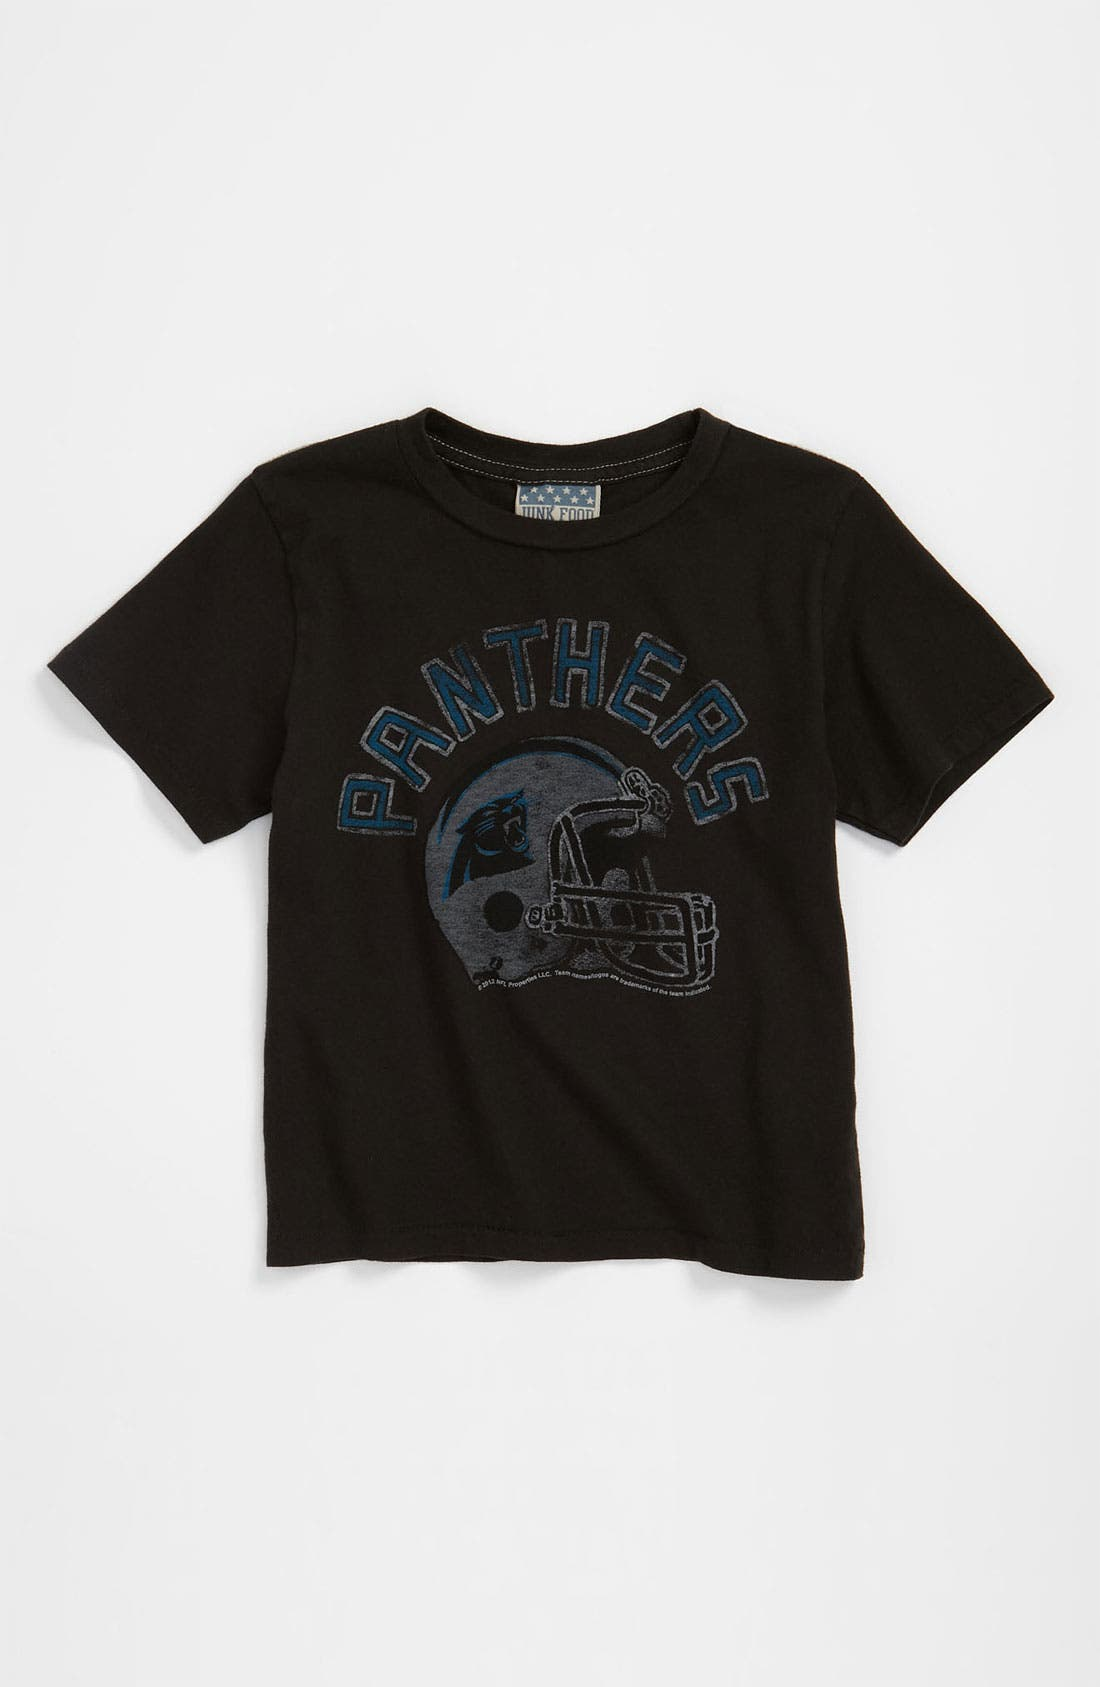 Alternate Image 1 Selected - Junk Food 'Carolina Panthers' T-Shirt (Toddler)